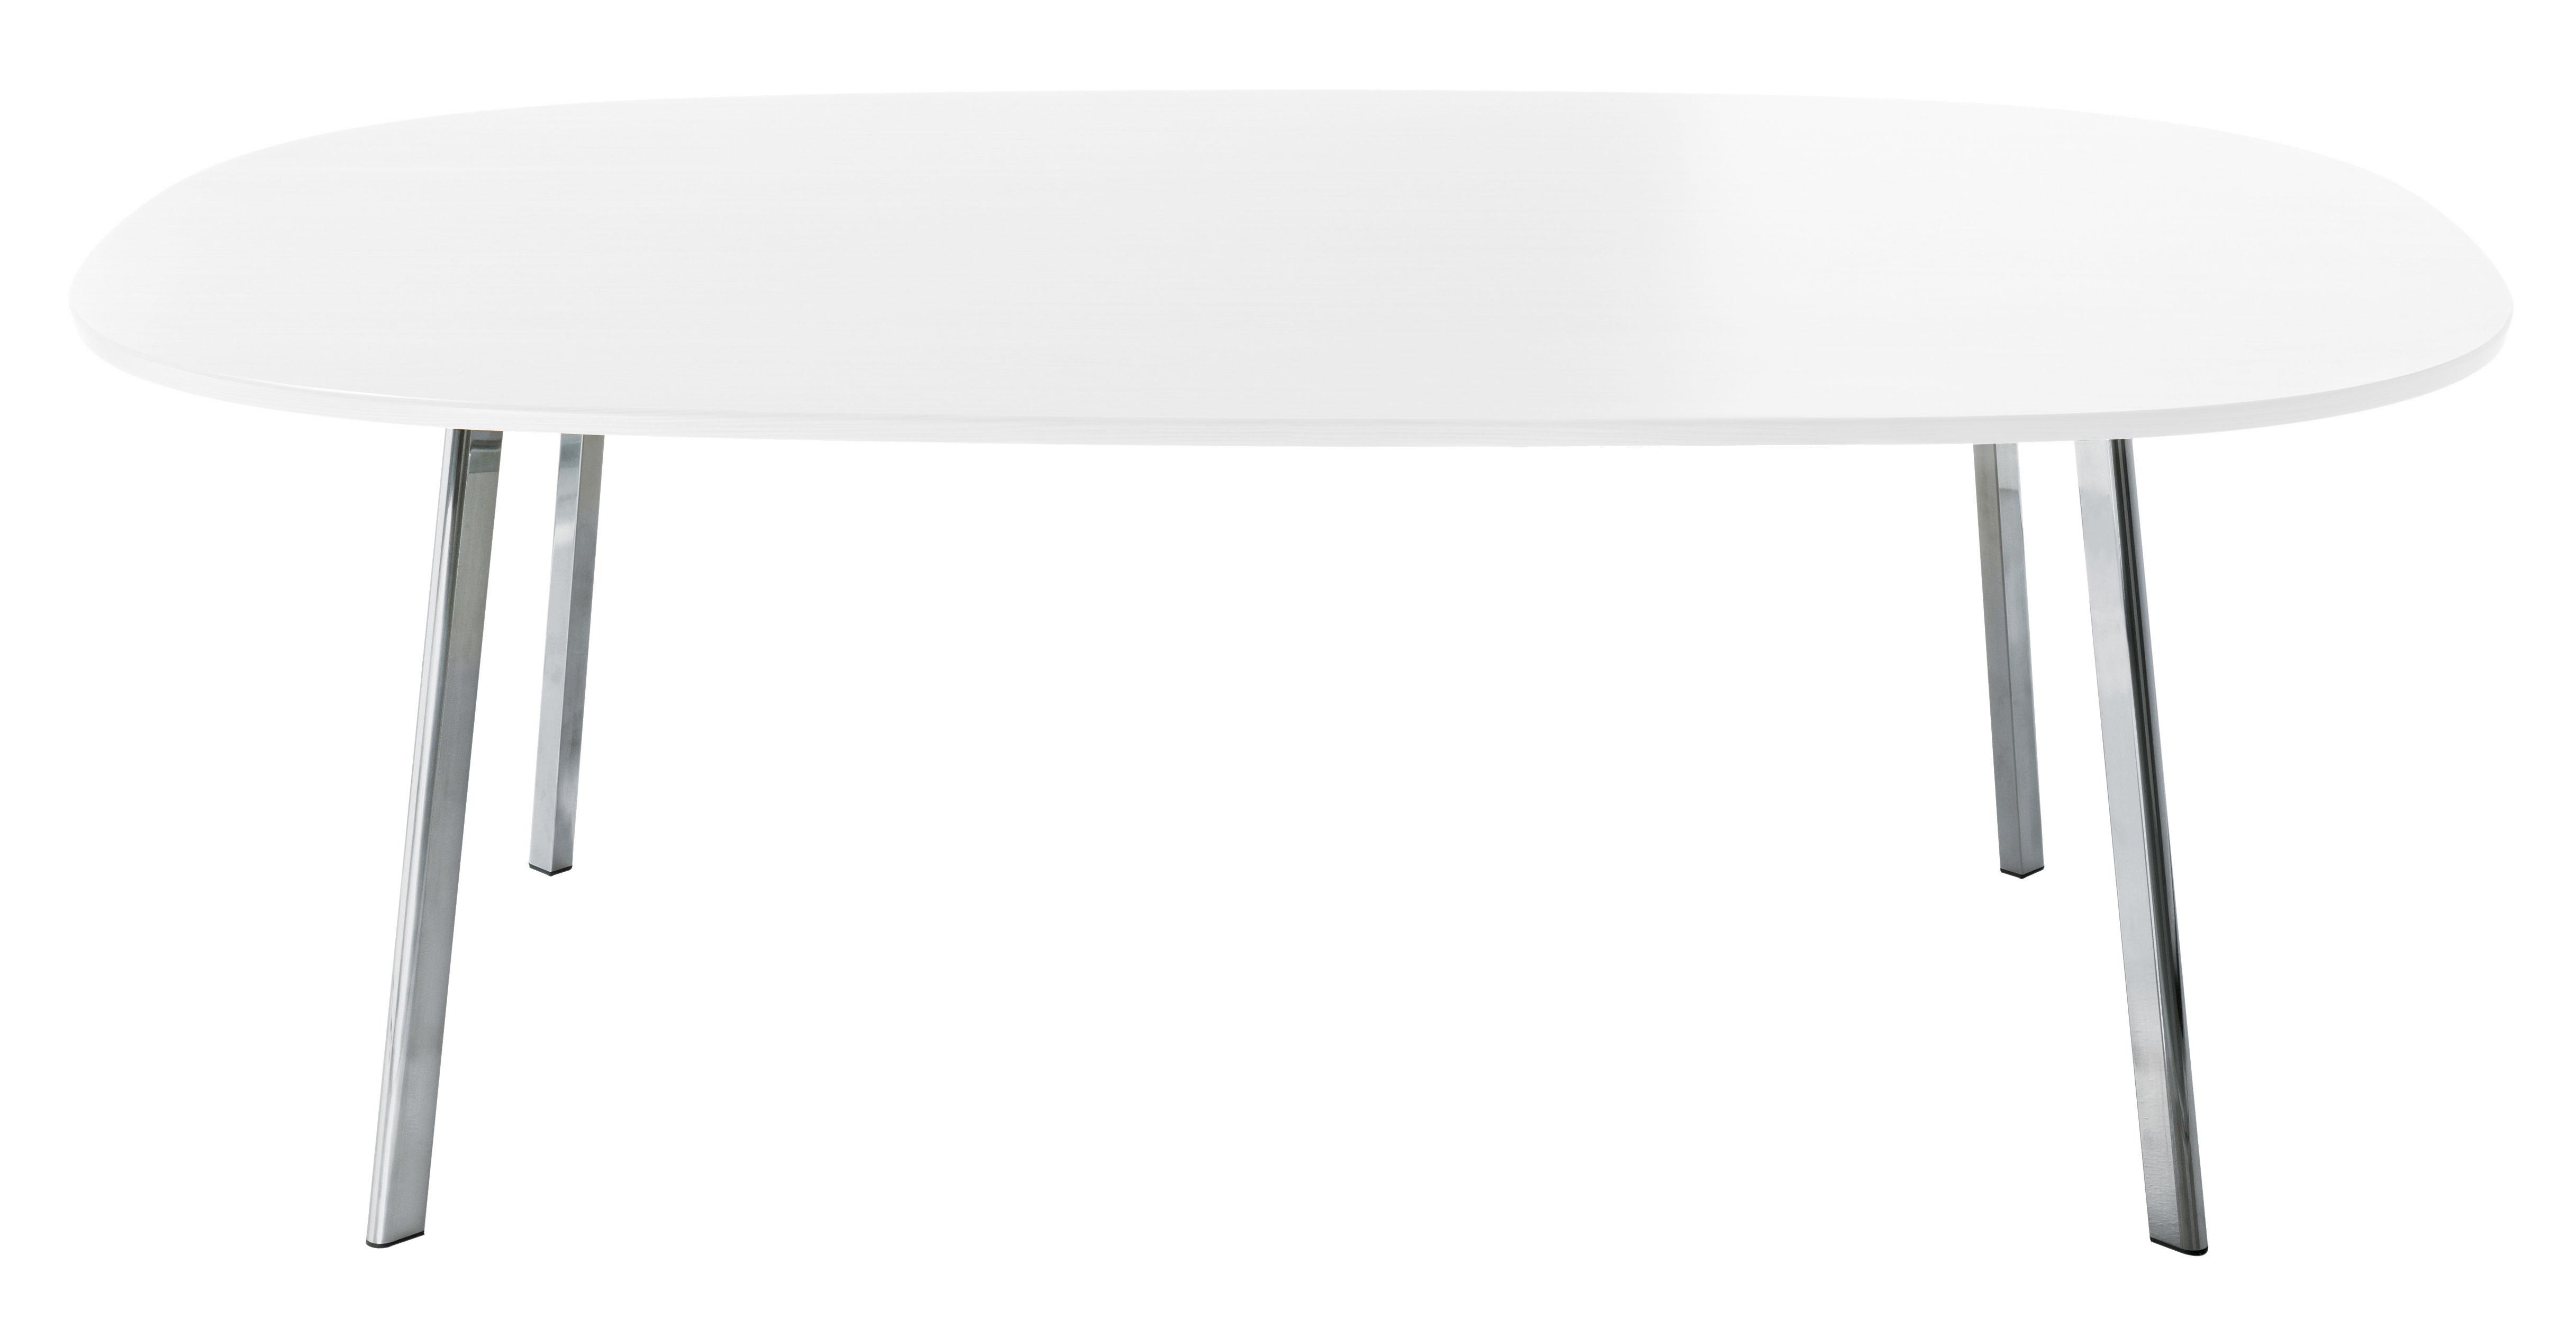 aktion - Style industriel - Déjà-vu rechteckiger Tisch 200 cm - Magis - Platte: weiß - lackierte Holzfaserplatte, poliertes Aluminium